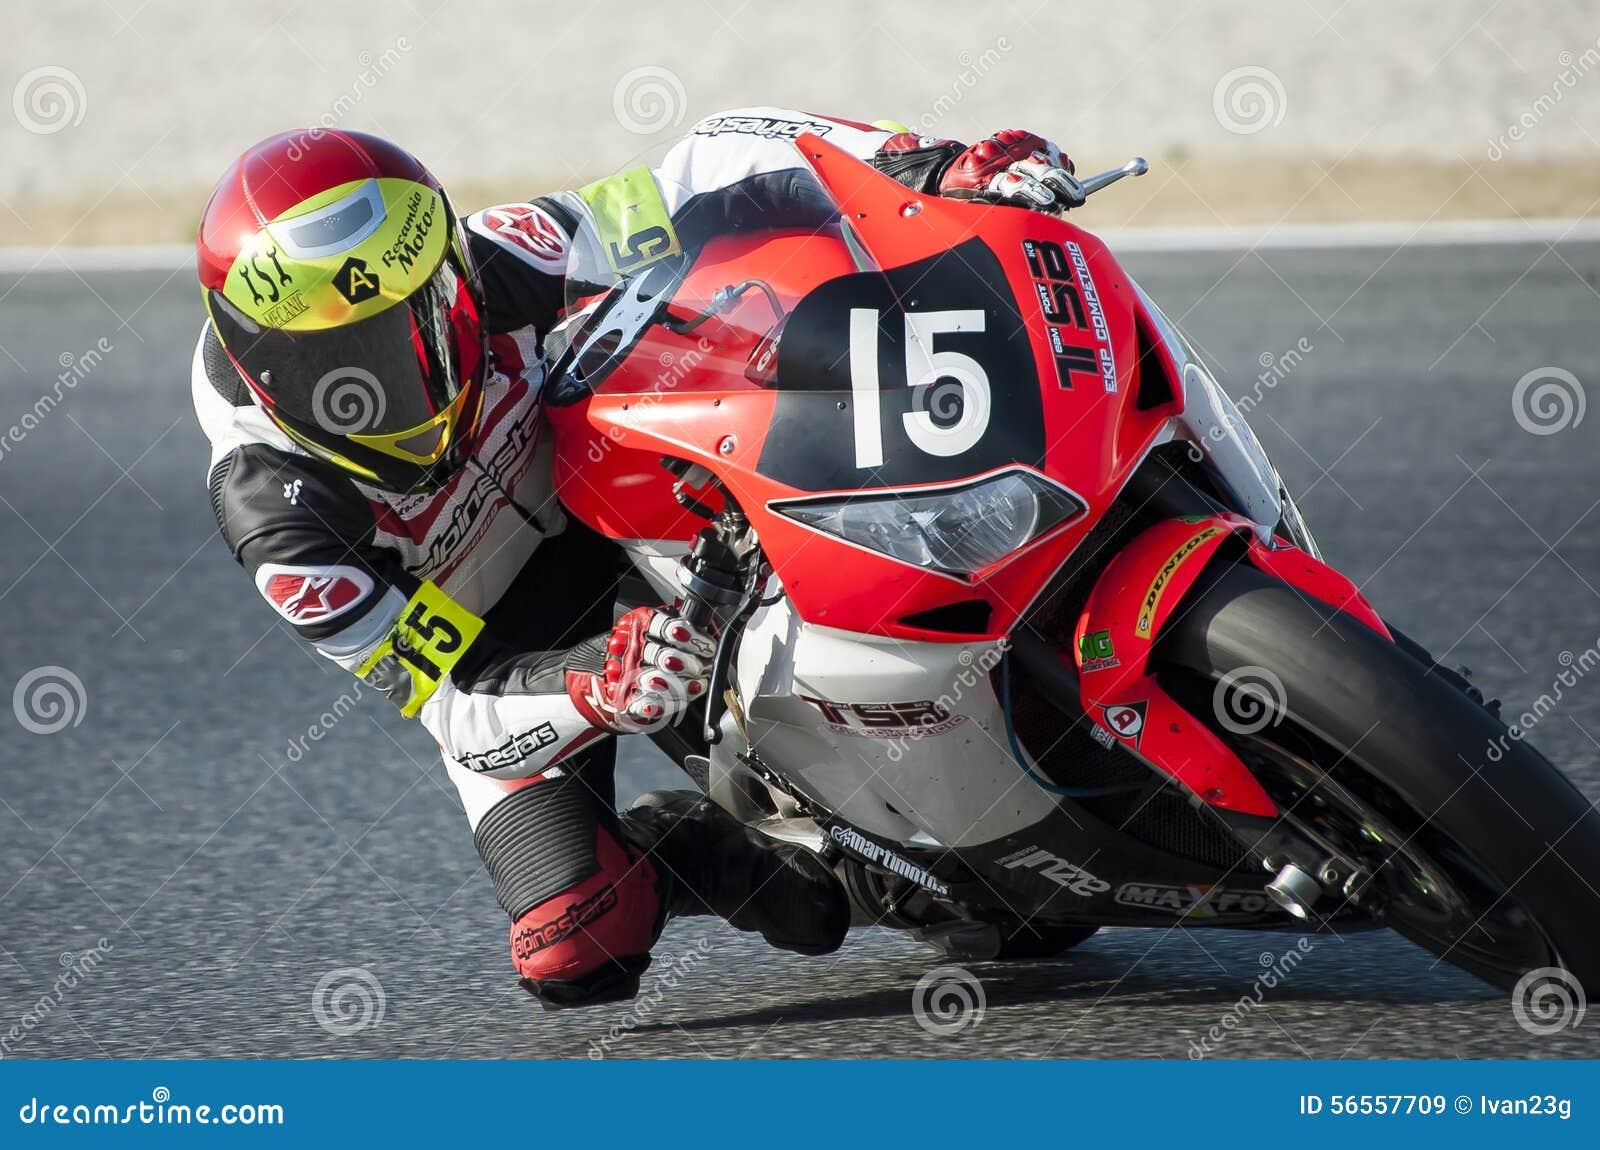 Download 24 ΑΝΤΟΧΗ ΩΡΩΝ MOTORCYCLING ΤΗΣ ΒΑΡΚΕΛΩΝΗΣ Εκδοτική Στοκ Εικόνα - εικόνα από γρήγορα, ισπανία: 56557709